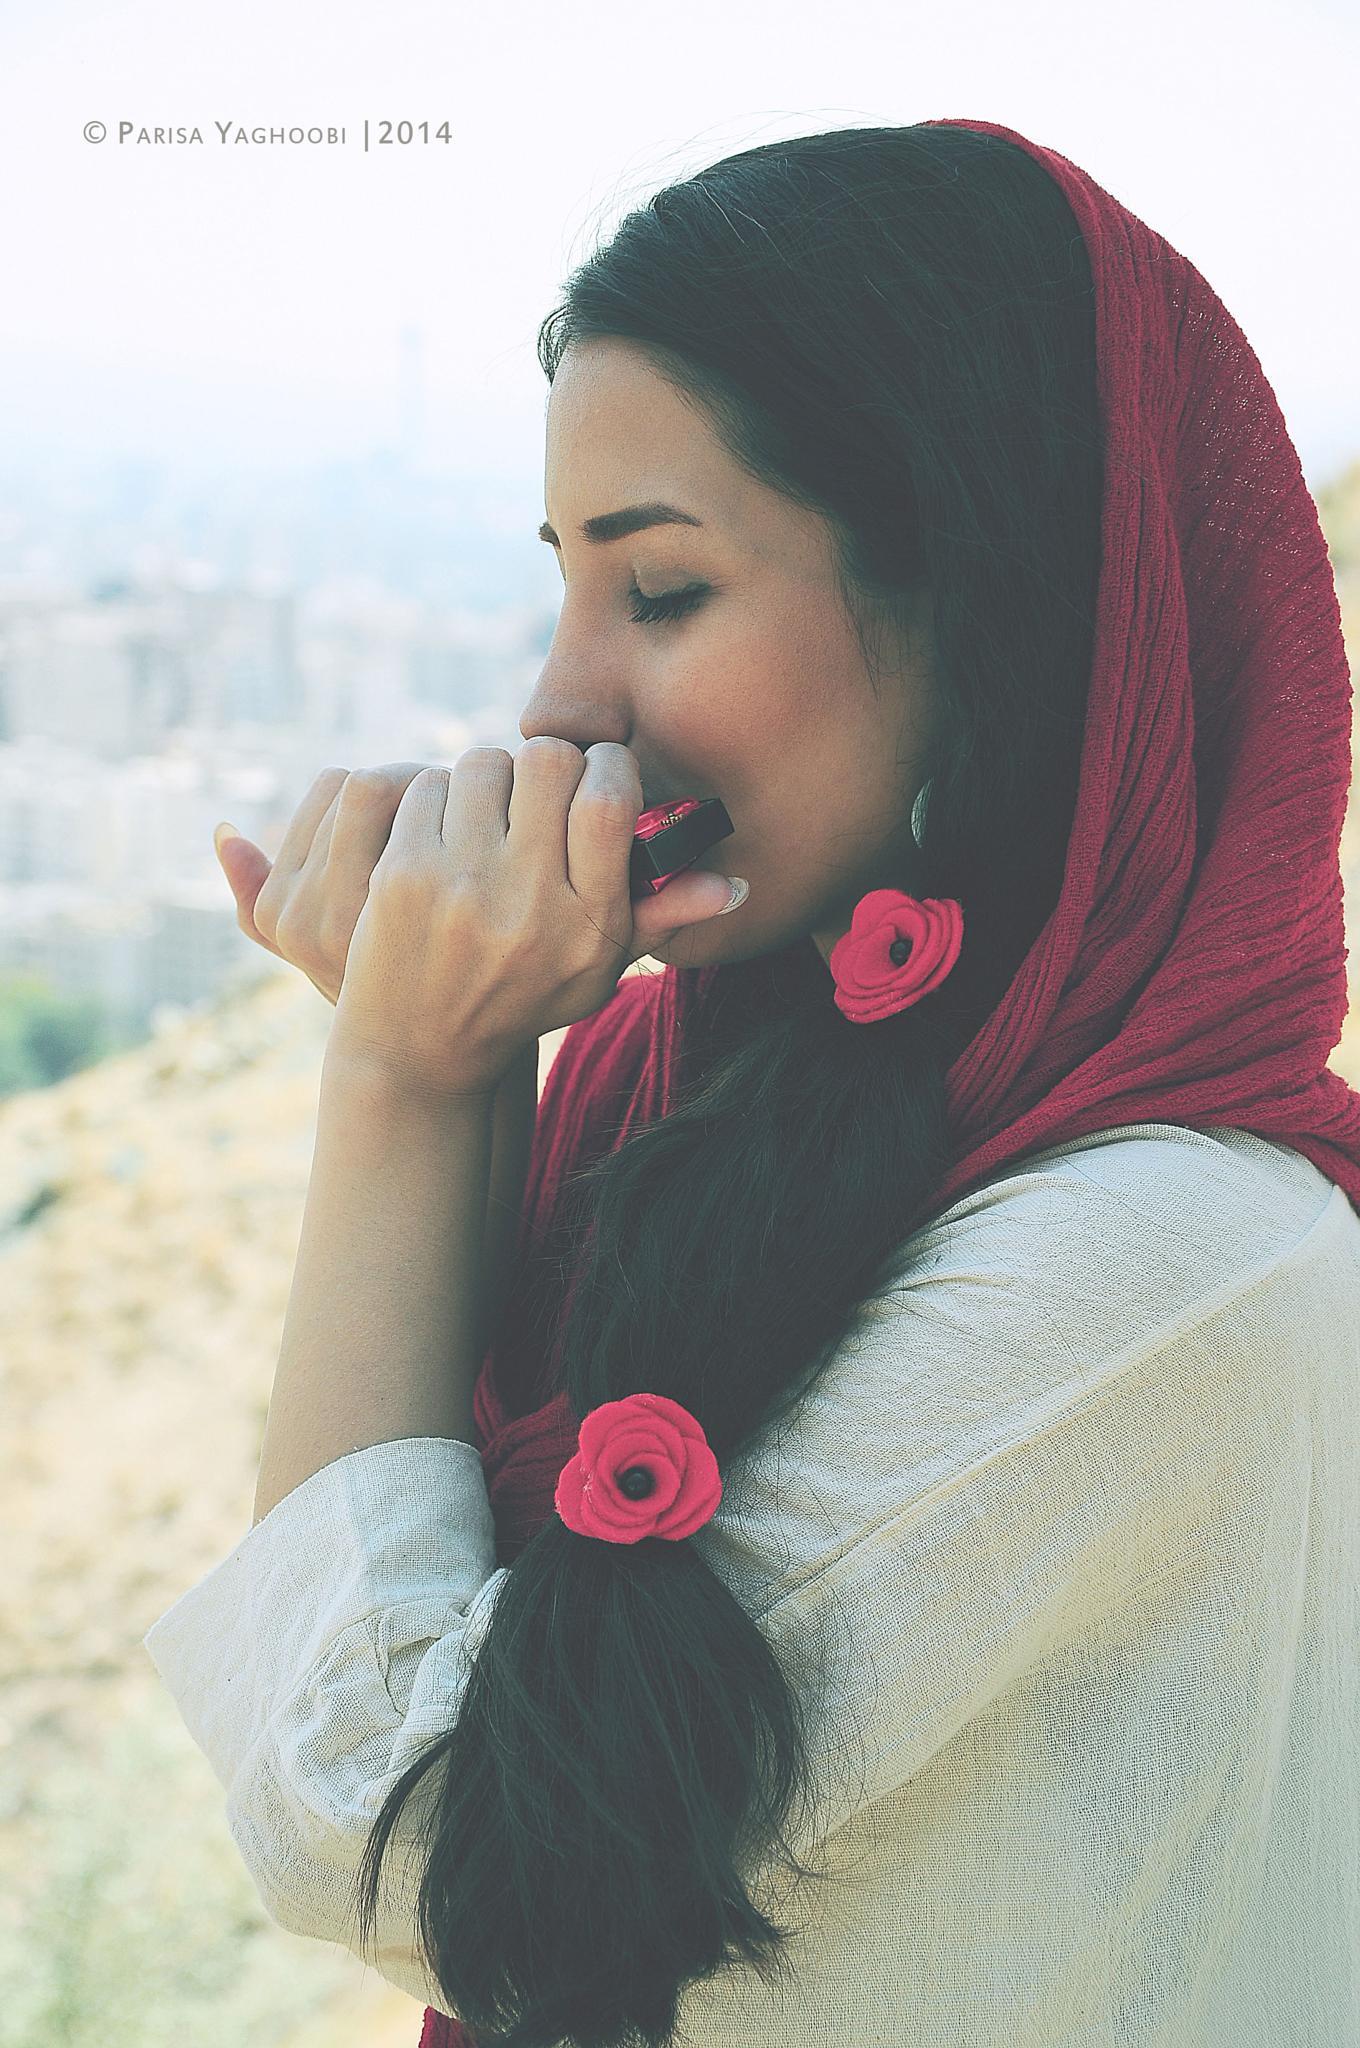 Lifestyle by Parisa Yaghoobi